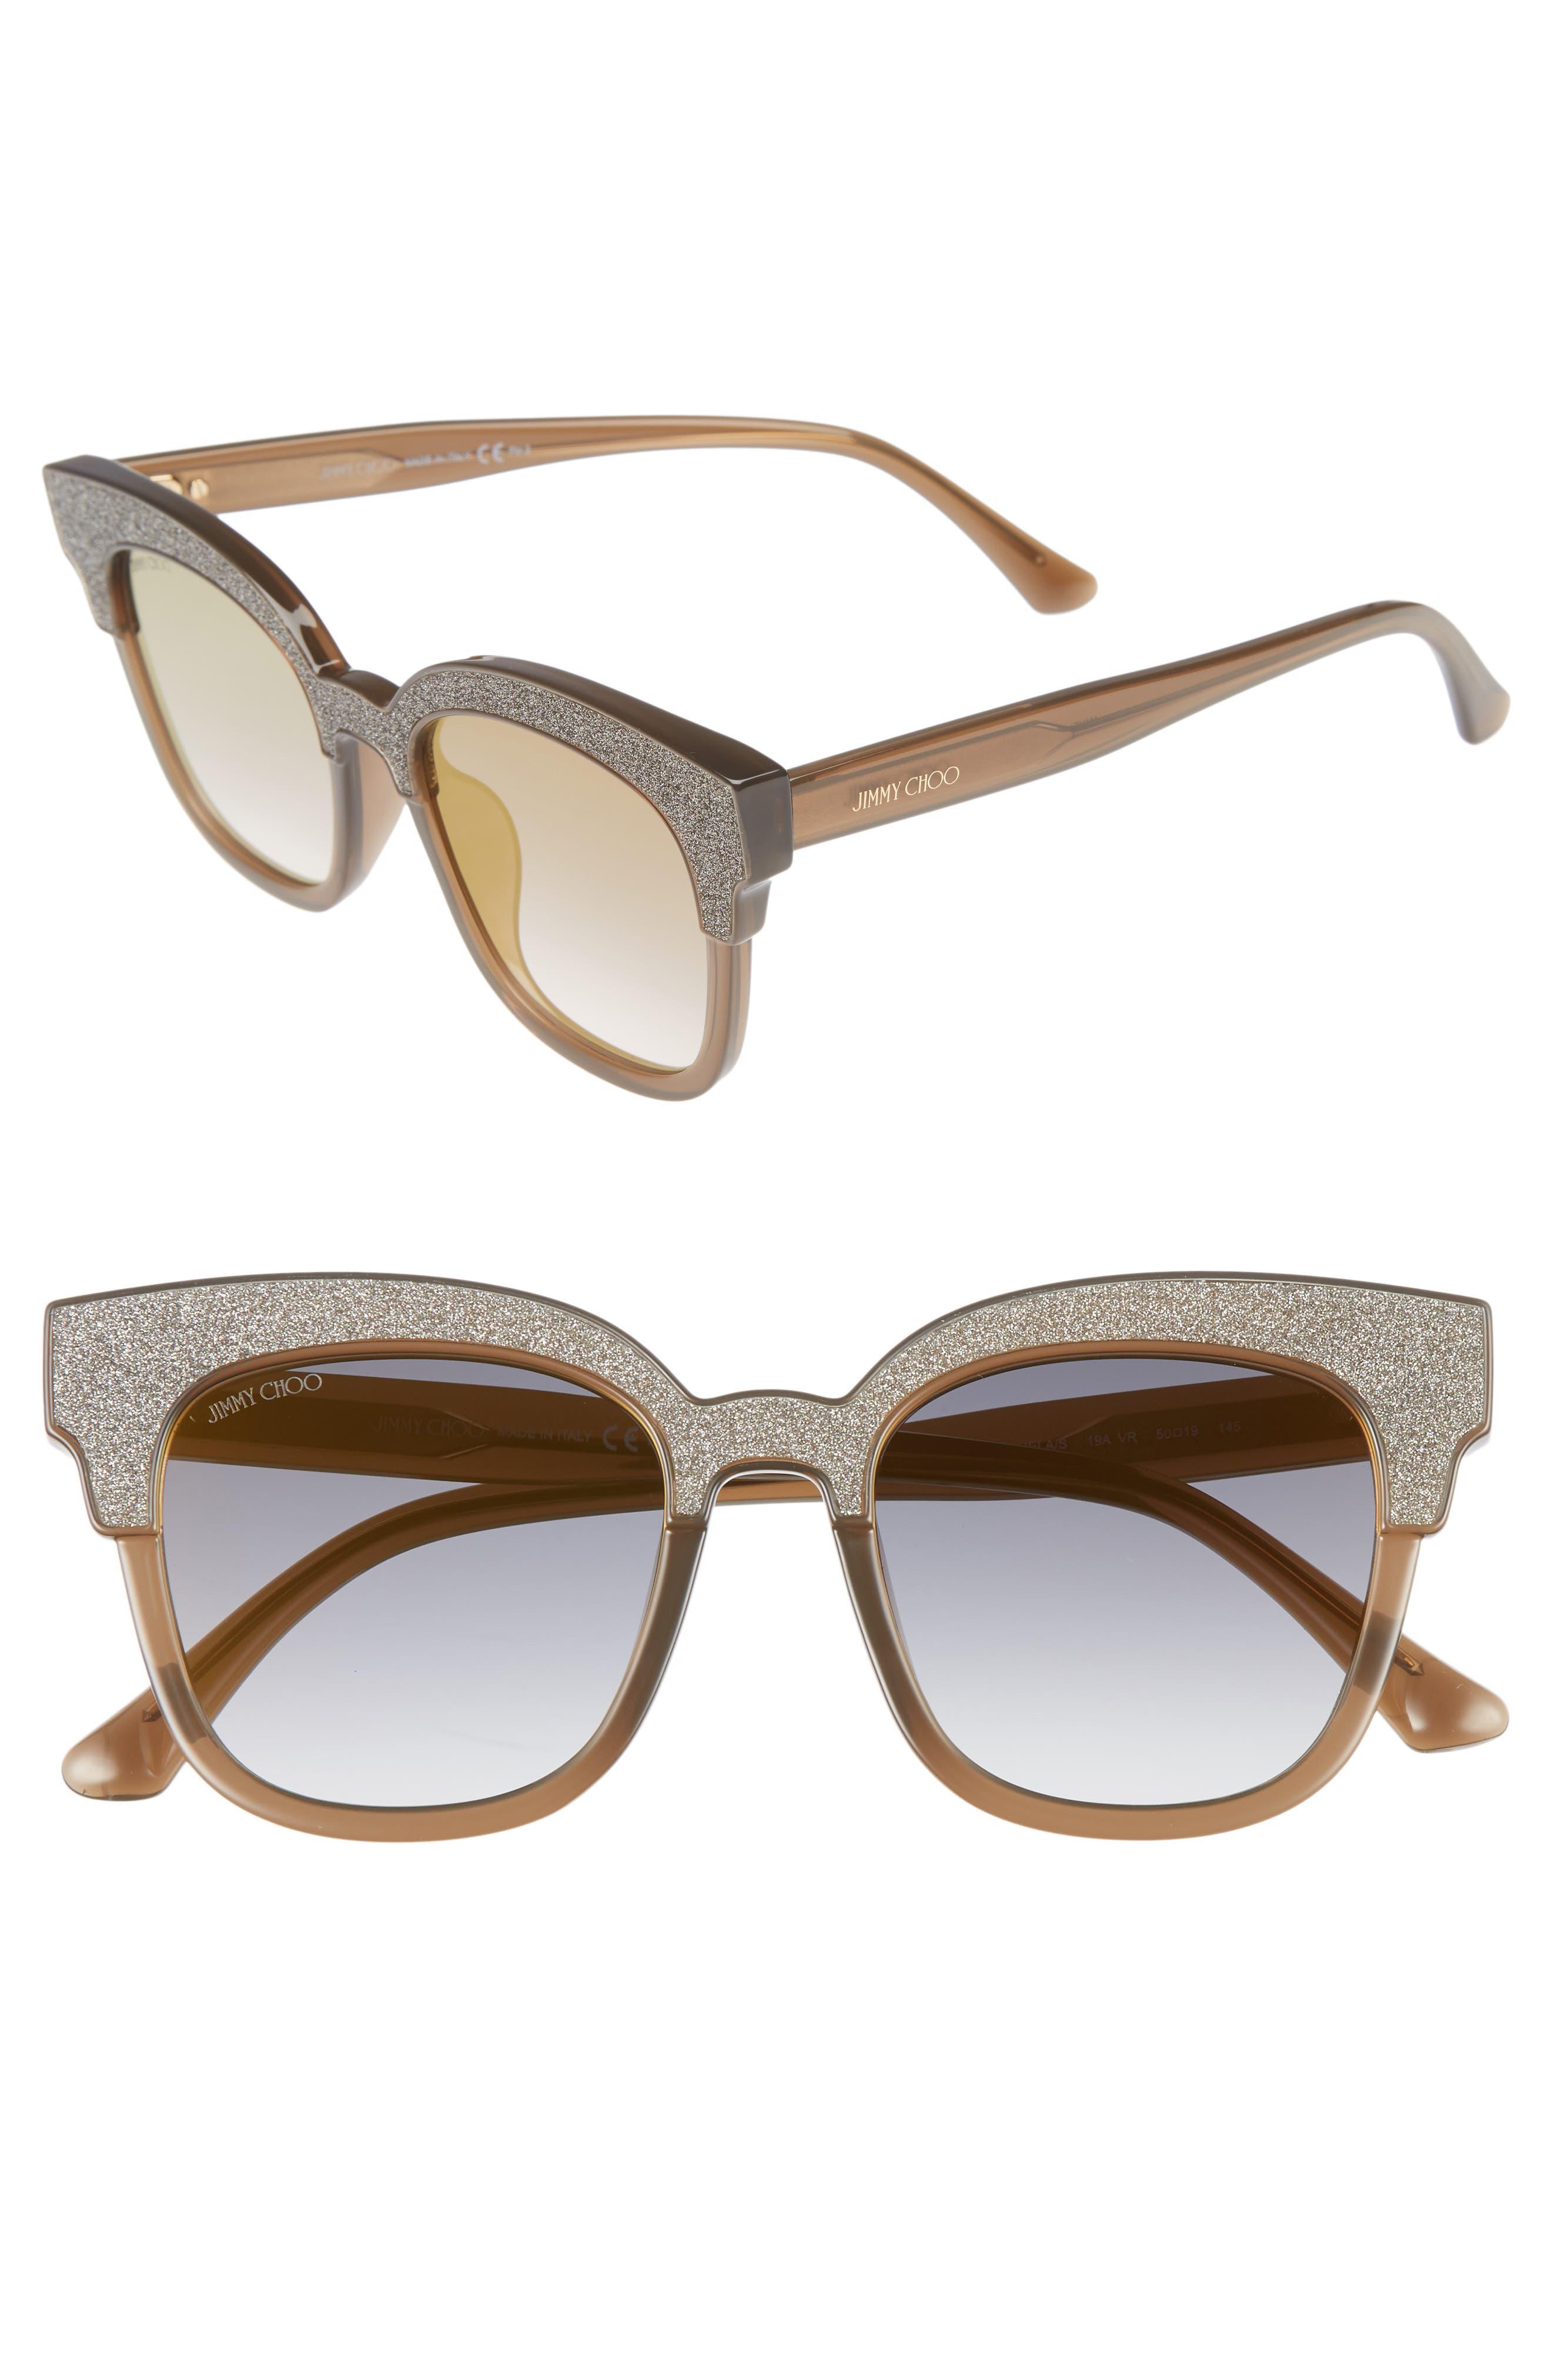 Main Image - Jimmy Choo Mayelas 50mm Cat Eye Sunglasses